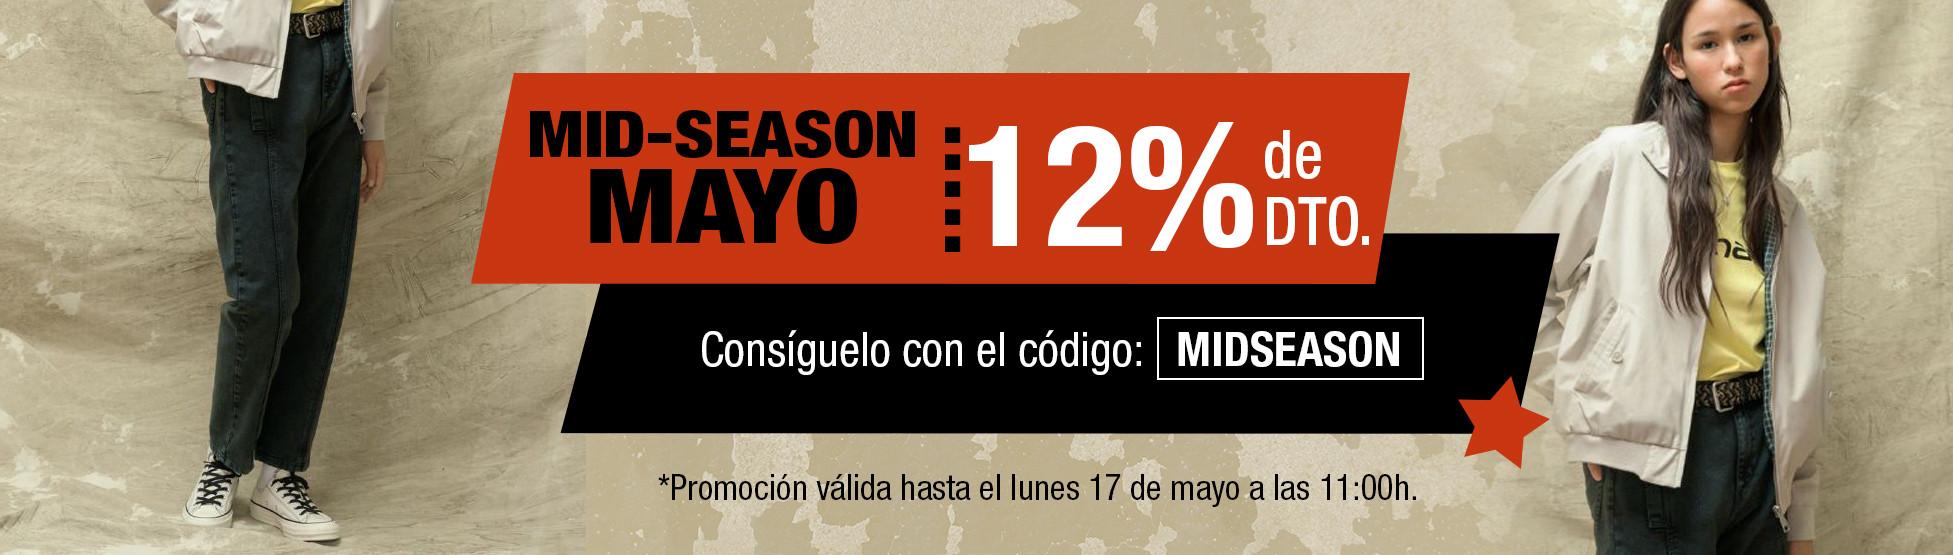 Mid Season Mayo 2021